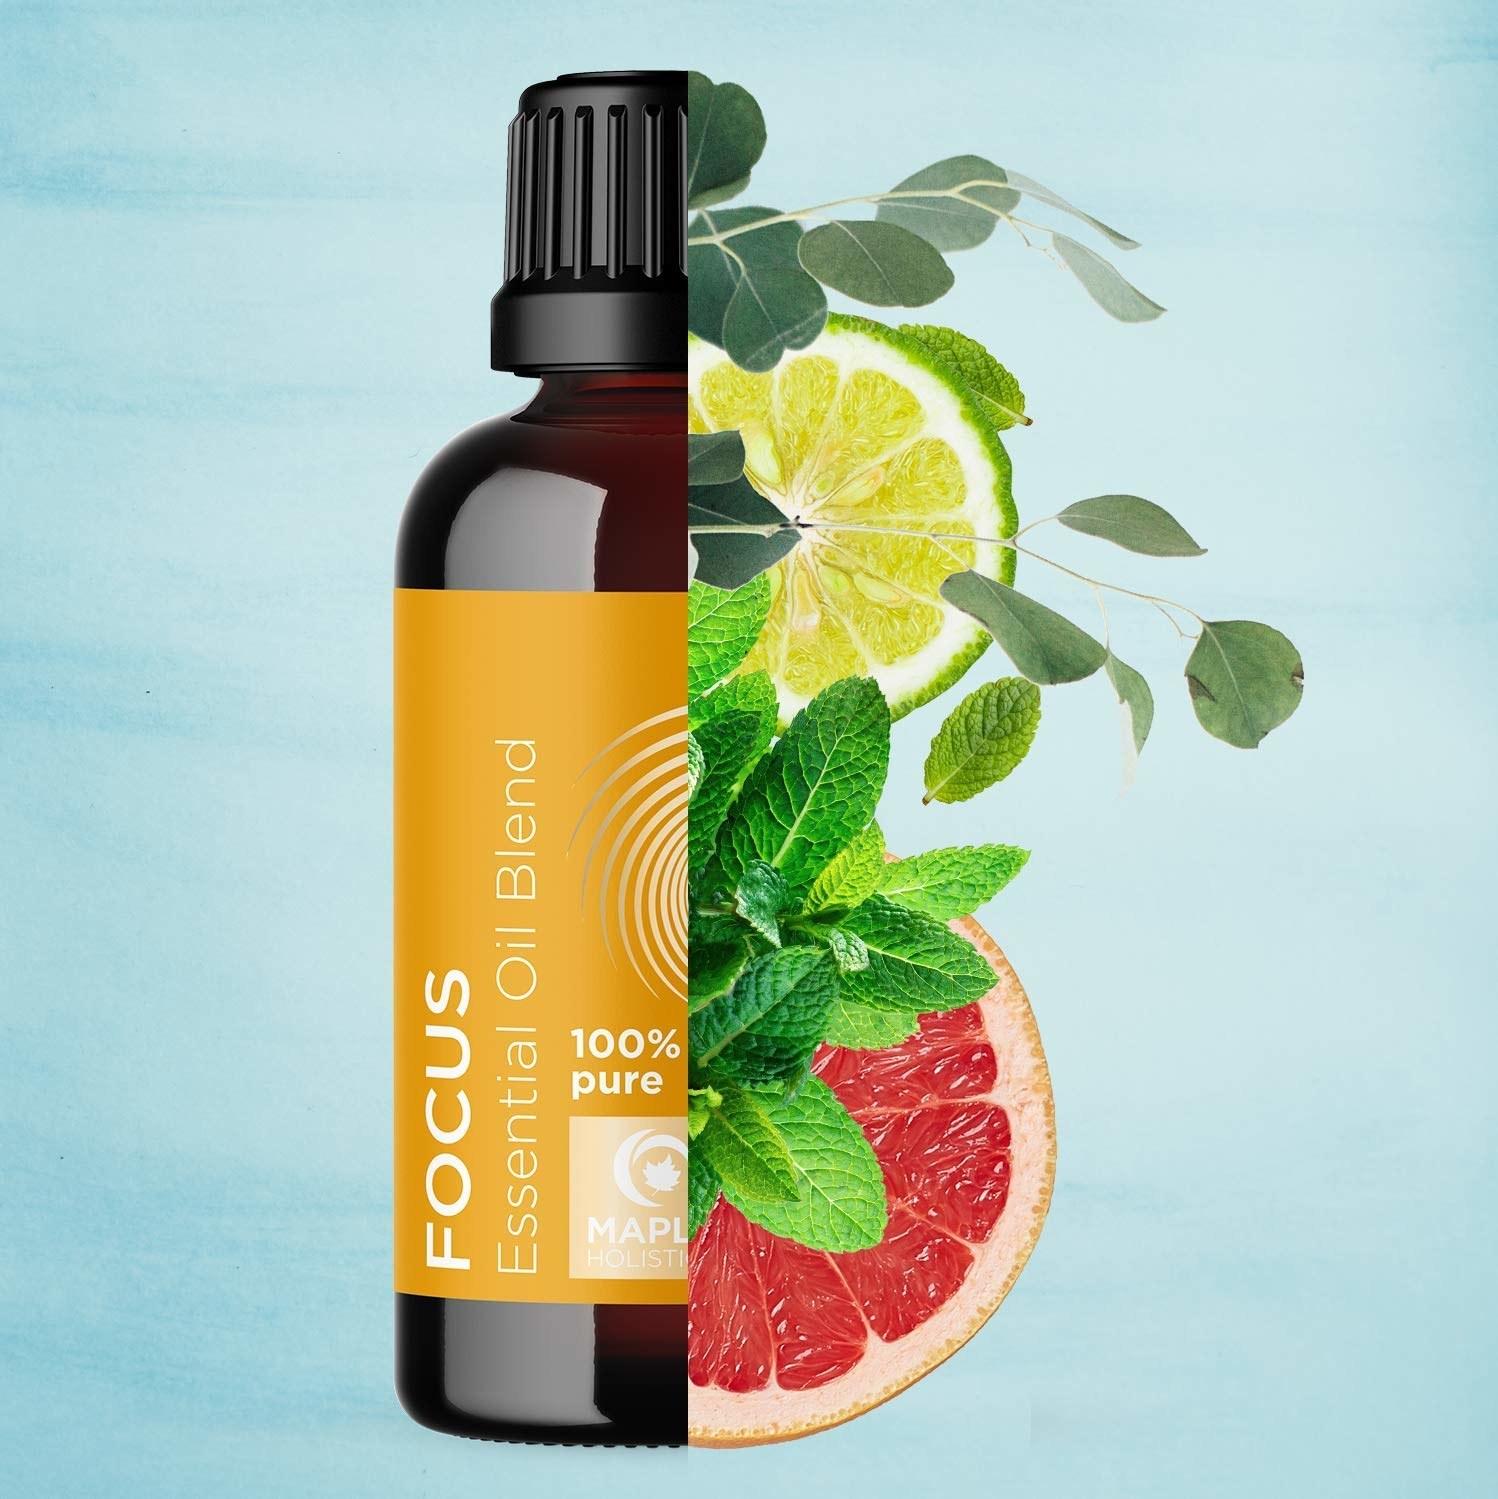 bottle of Focus essential oil blend